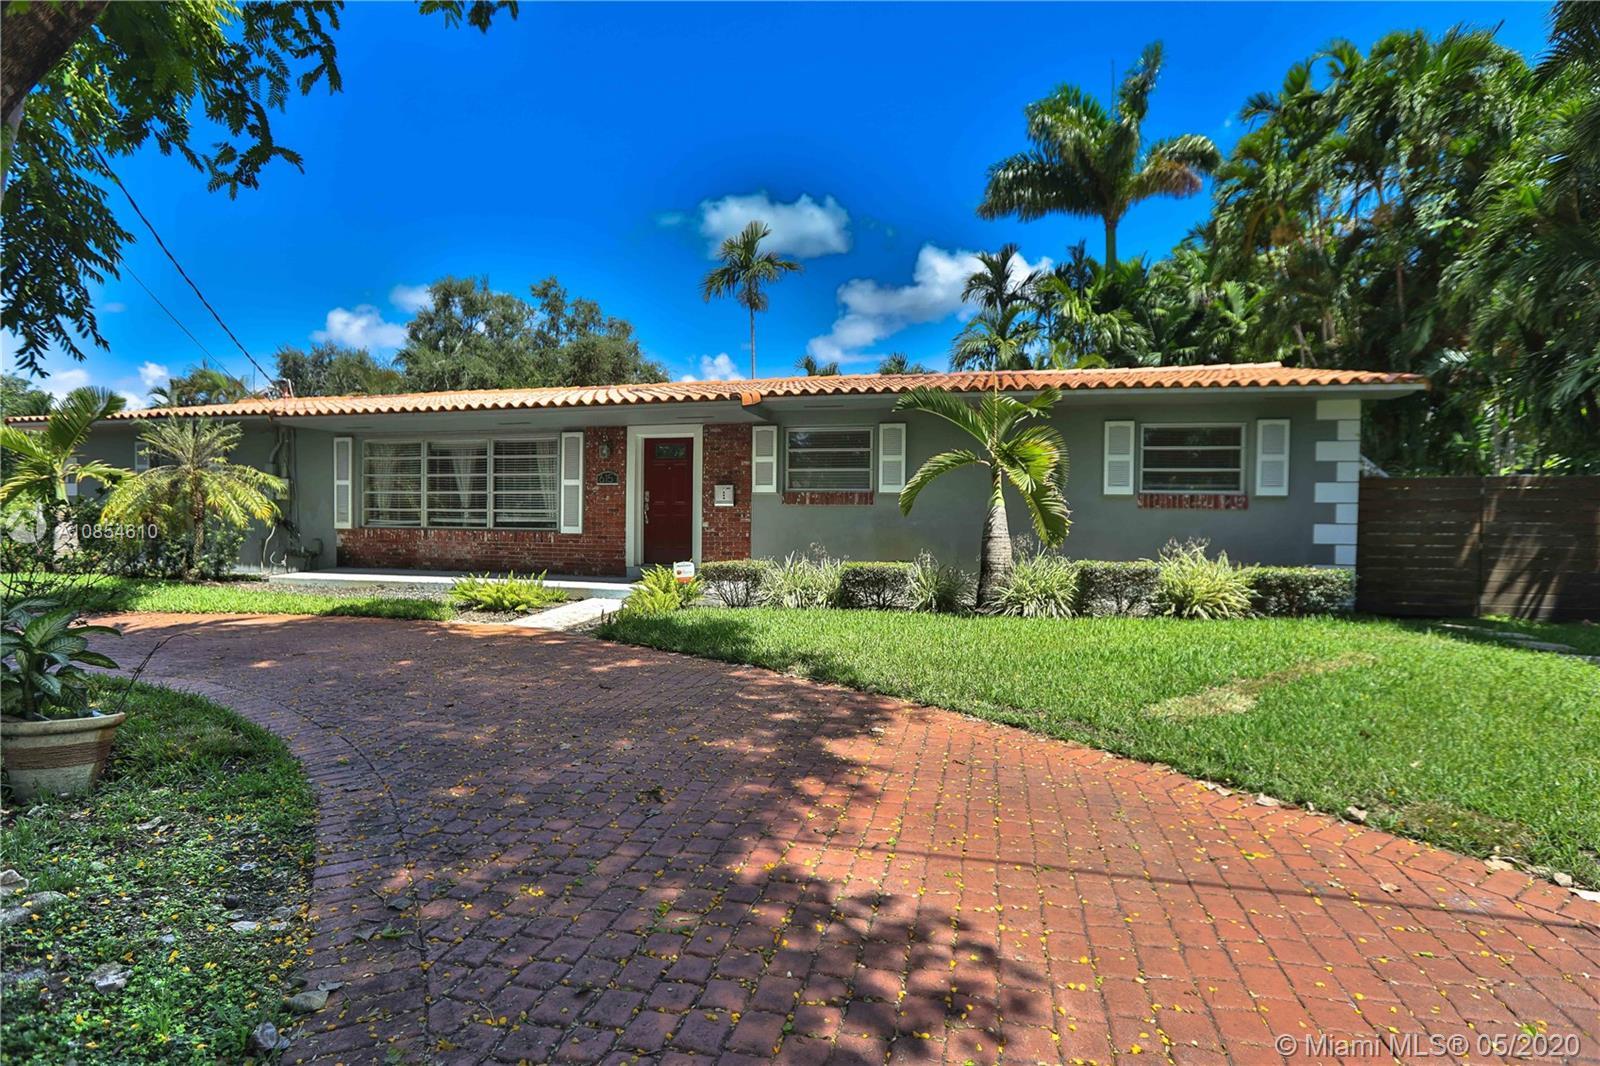 615 NE 115th St, Miami Shores, Florida